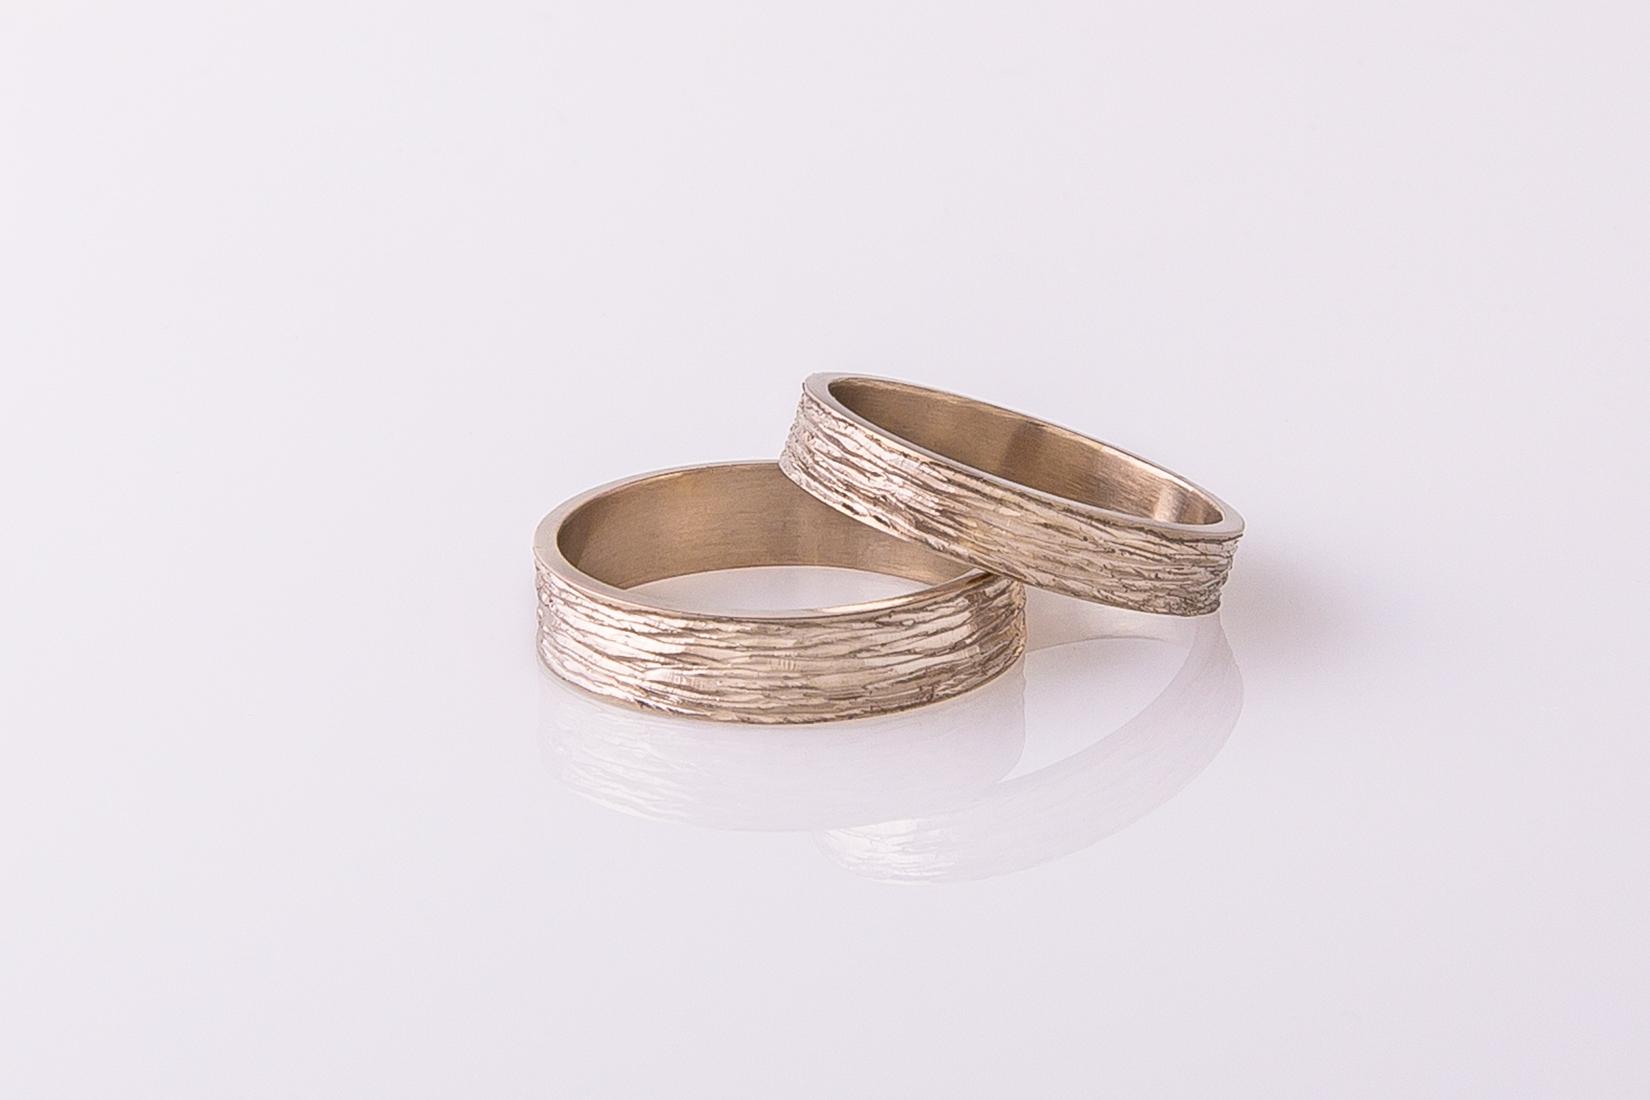 goudmerk-ring-trouwen-wit-goud-grof-bewerkt